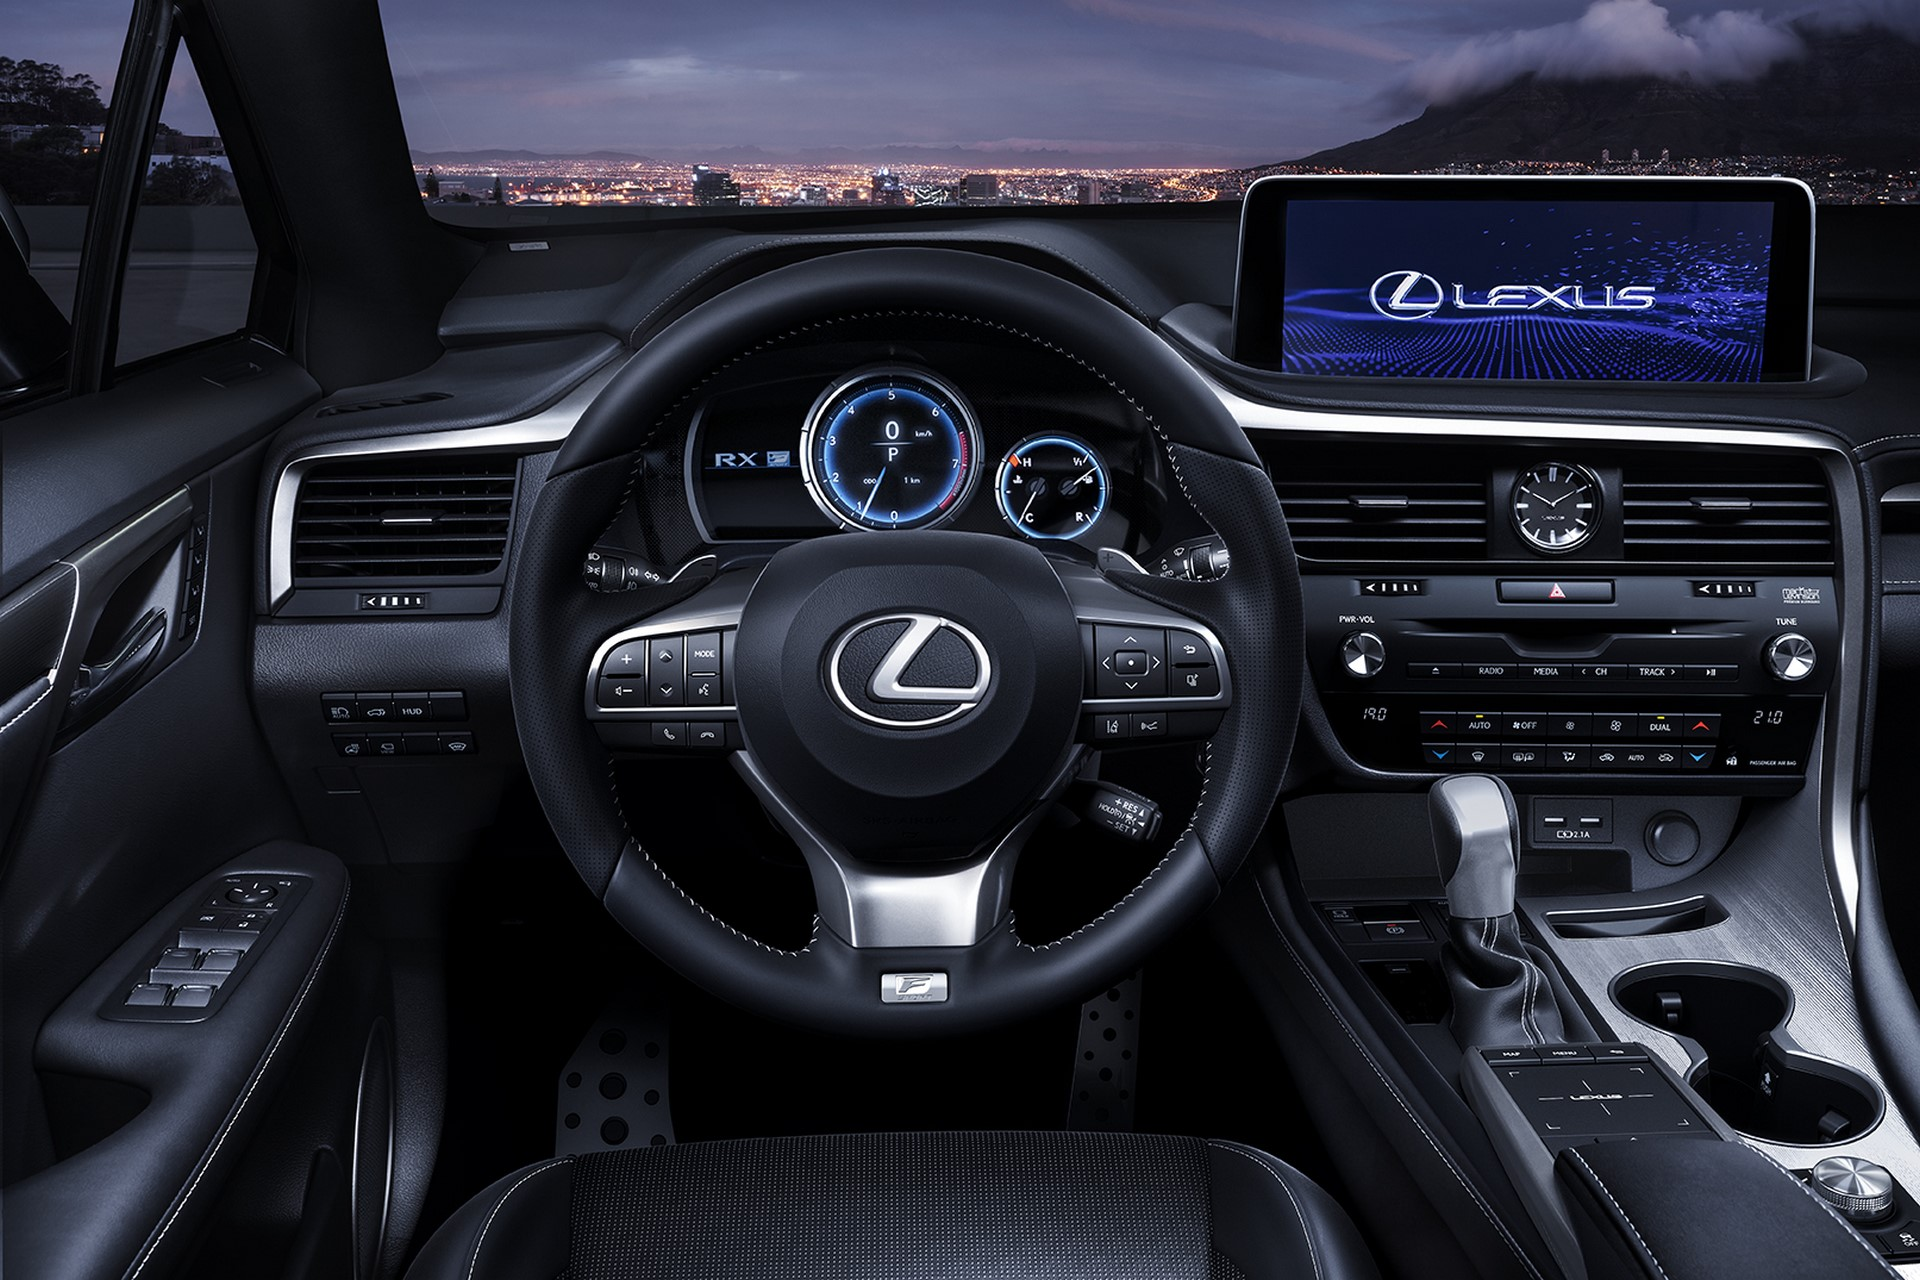 2020_Lexus_RX350_FSPORT_10_EC3E83D0E7427B63796D576E04F44409034ACA5D